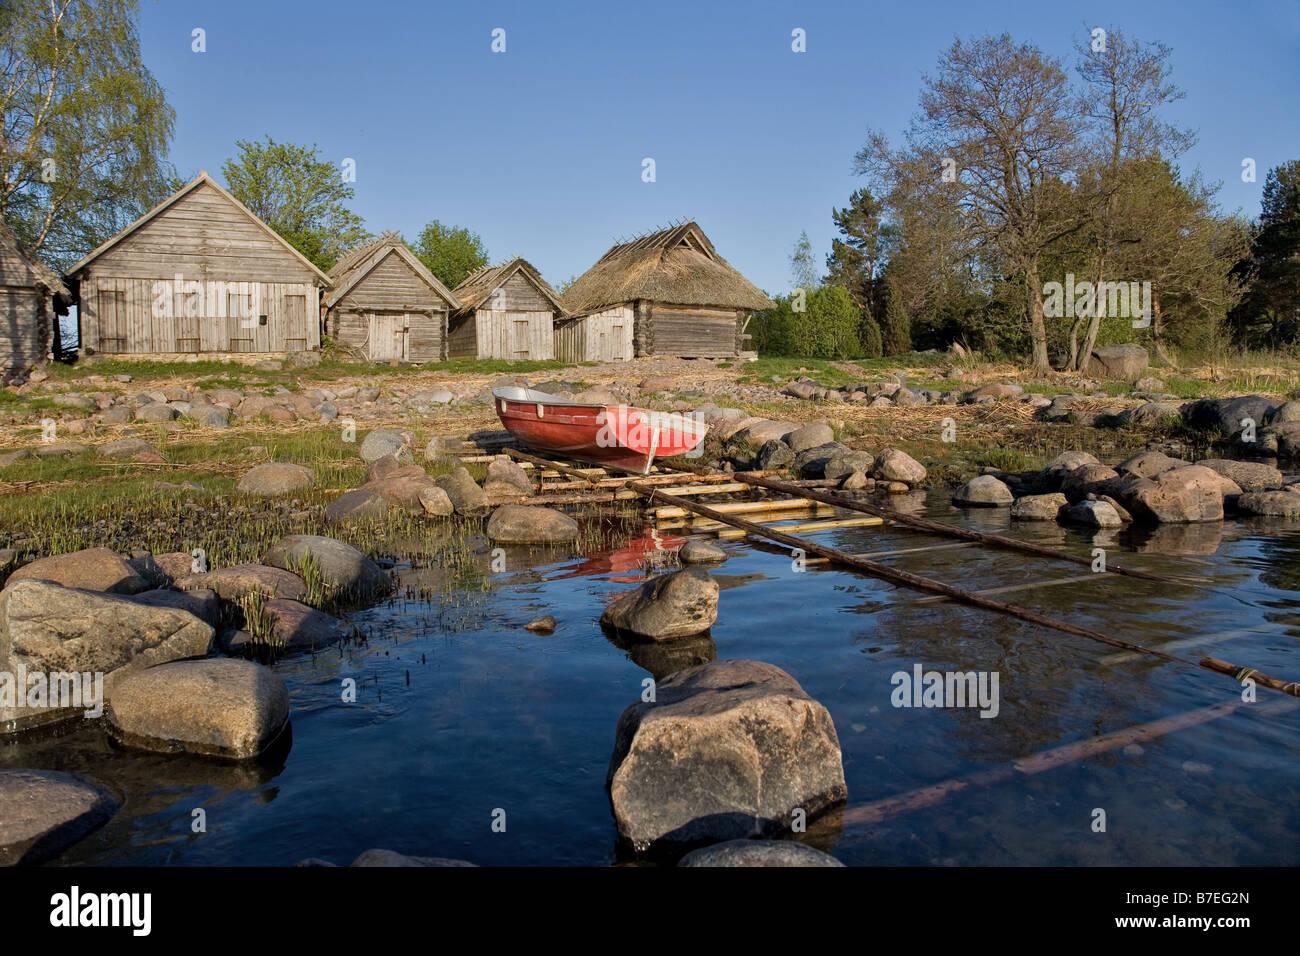 Altja fishing village l ne viru county lahemaa national park estonia europe